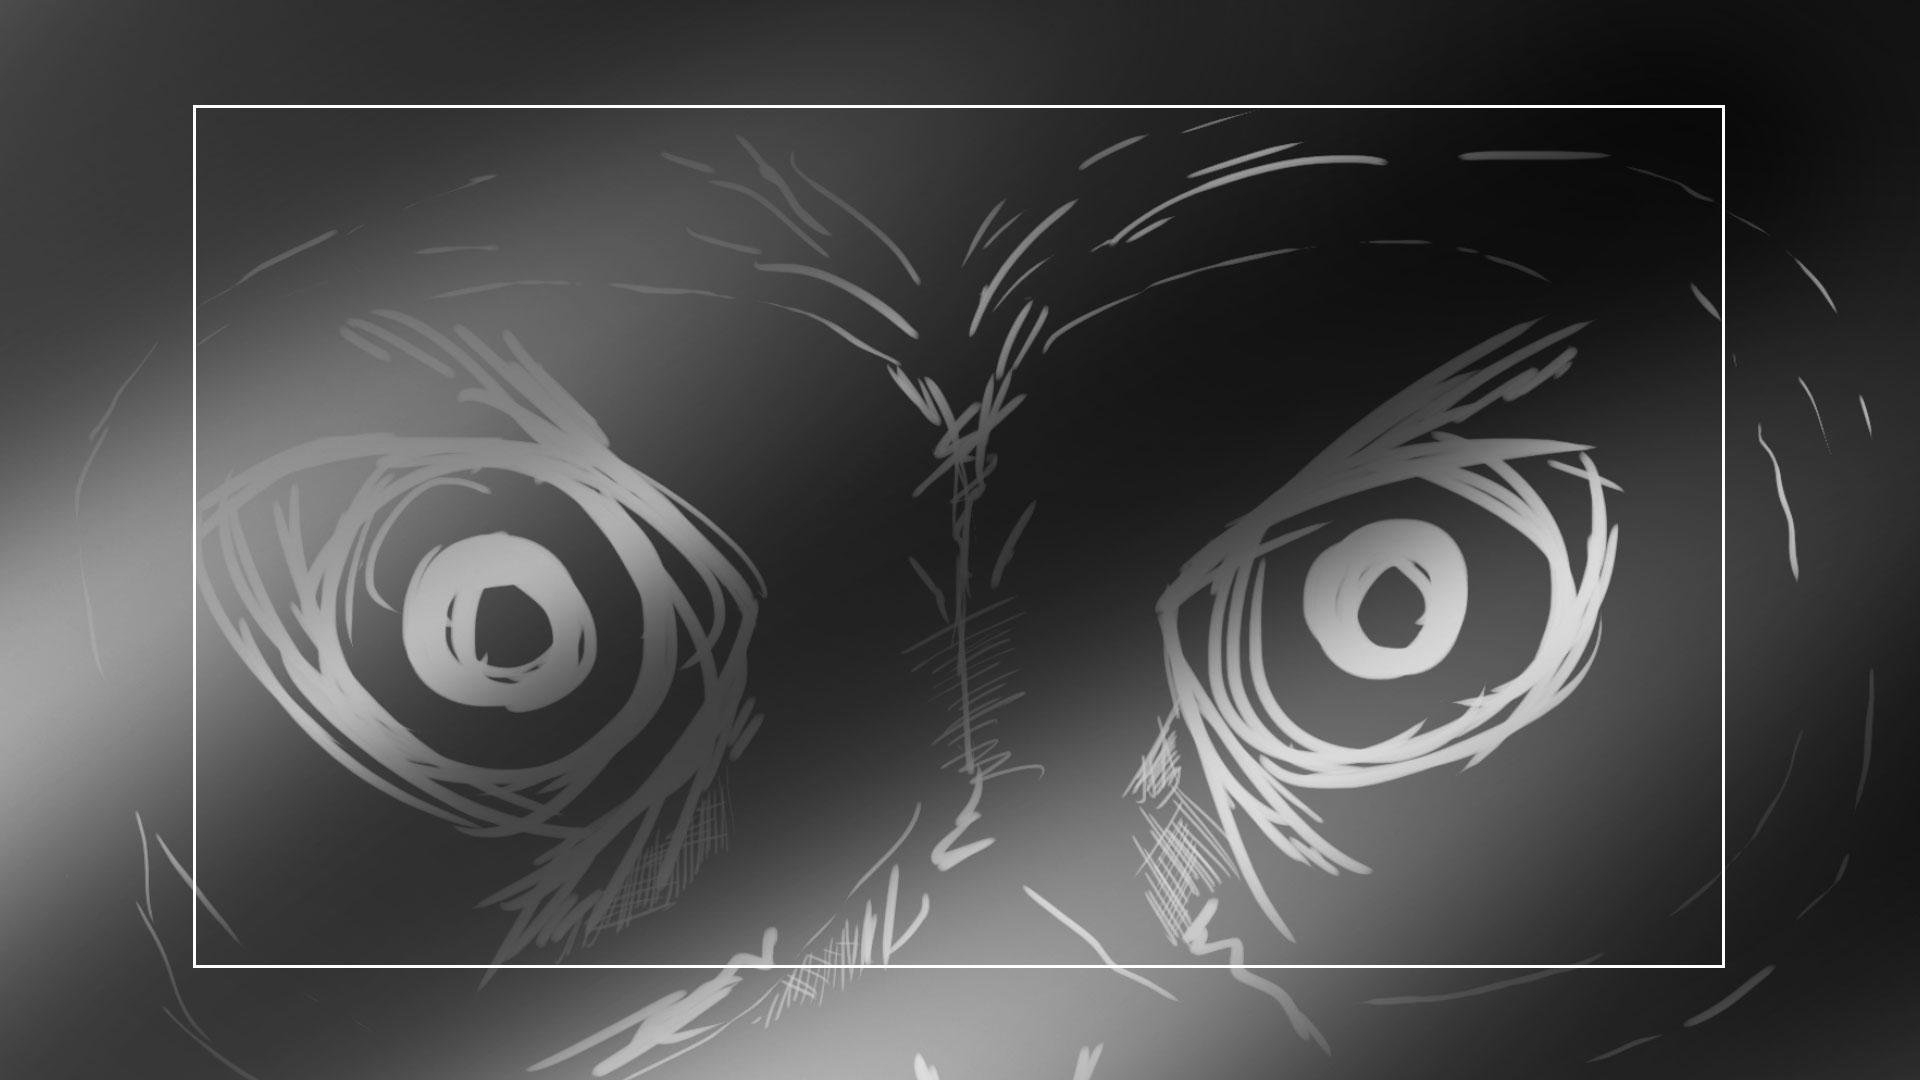 PSYCHO_Storyboard_Animatic_00861.jpg